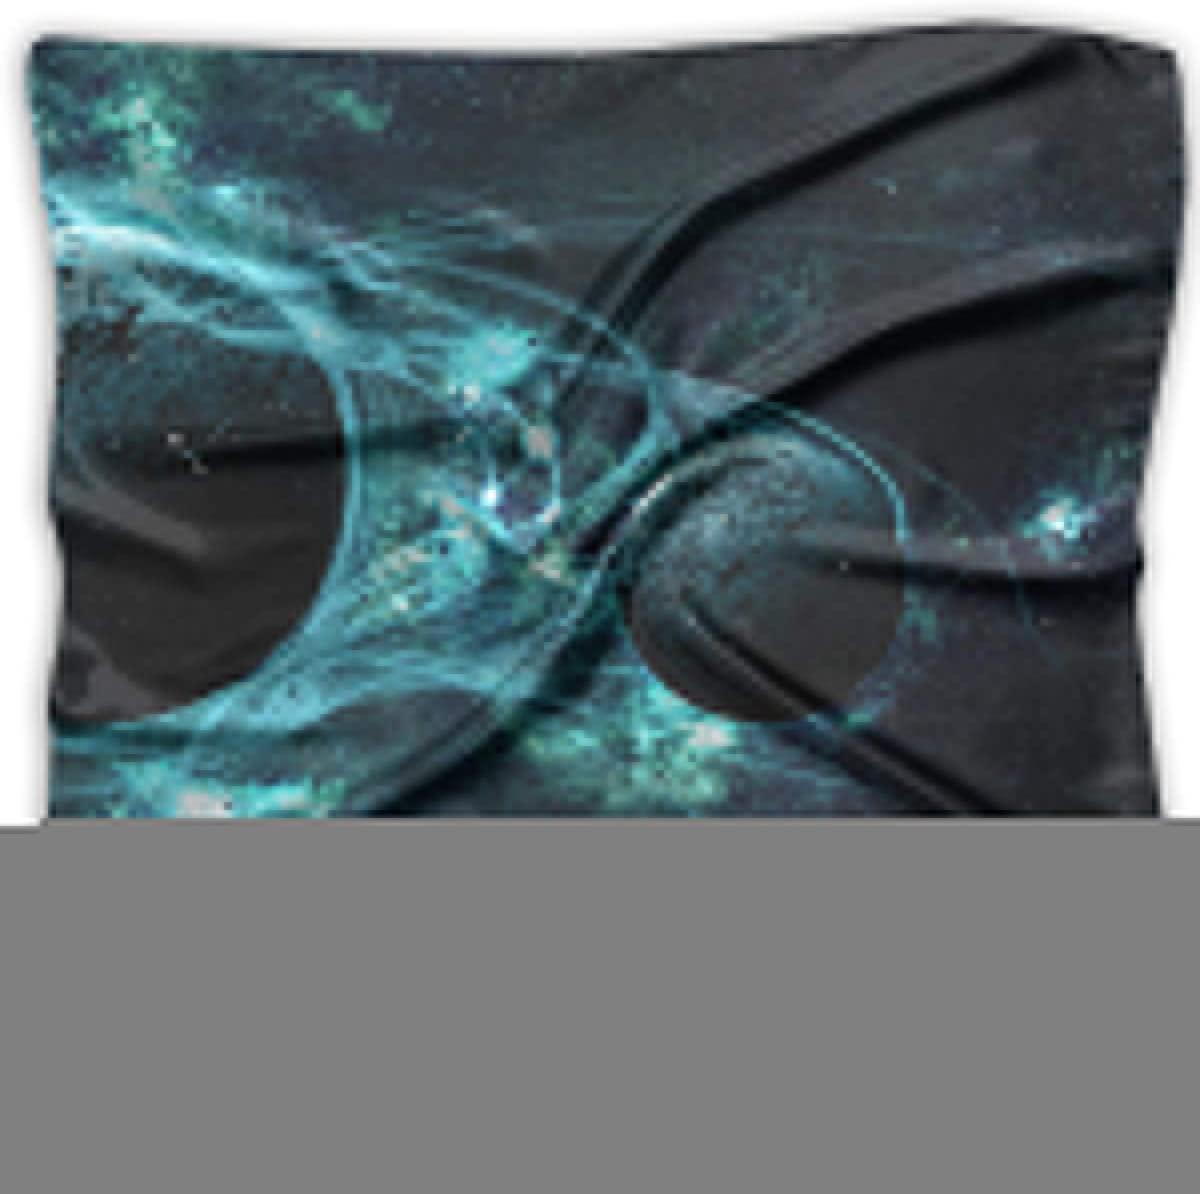 WFIRE Planet X Nibiru Solar System Contain Square Handkerchiefs Scarf Shawl Bandanas Headscarf Neckerchief